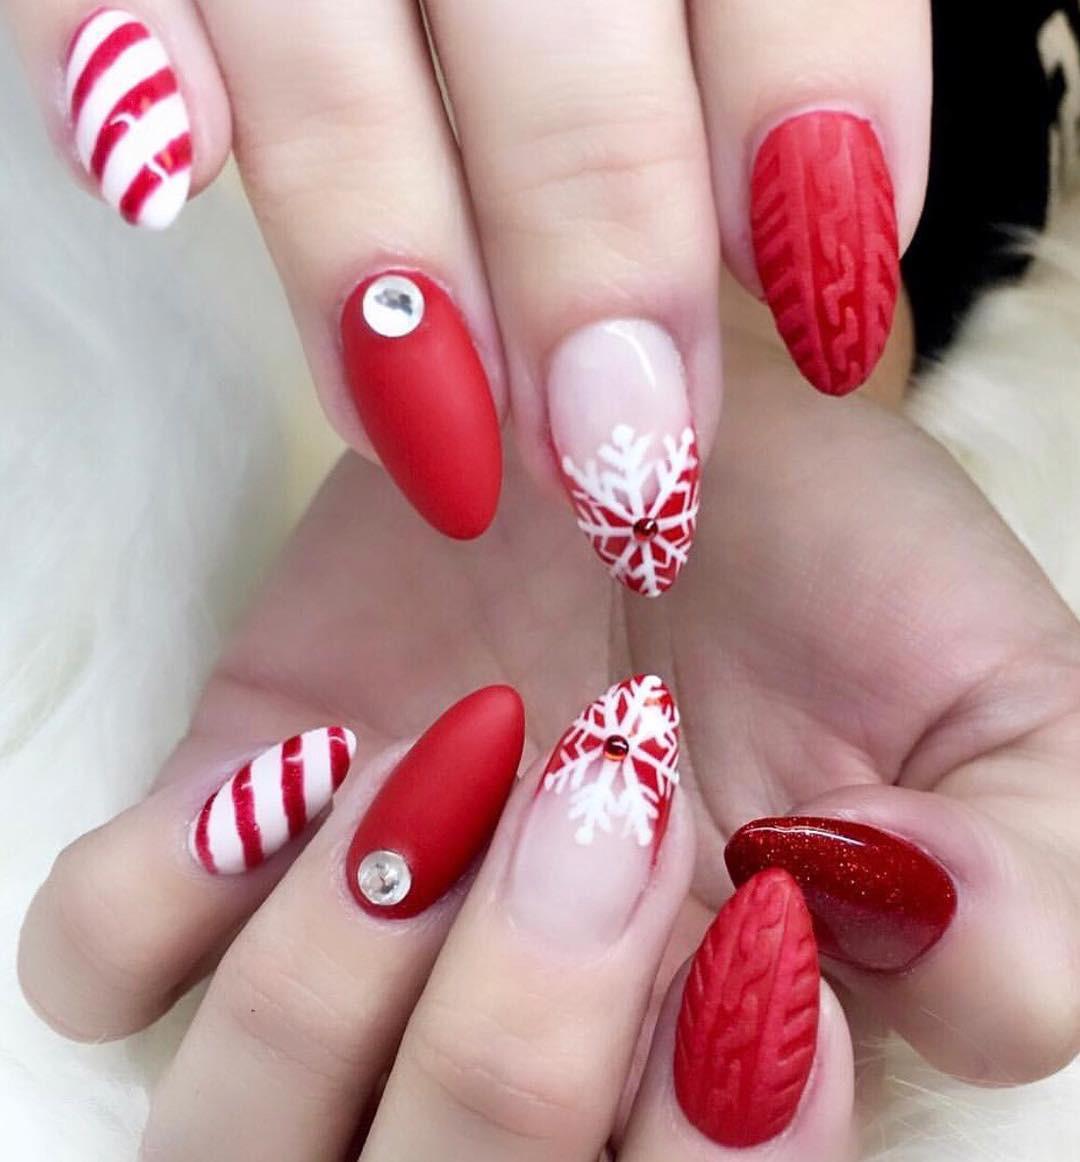 50+ Popular Festive Christmas Nail Art Design Ideas #Christmas #ChristmasNail